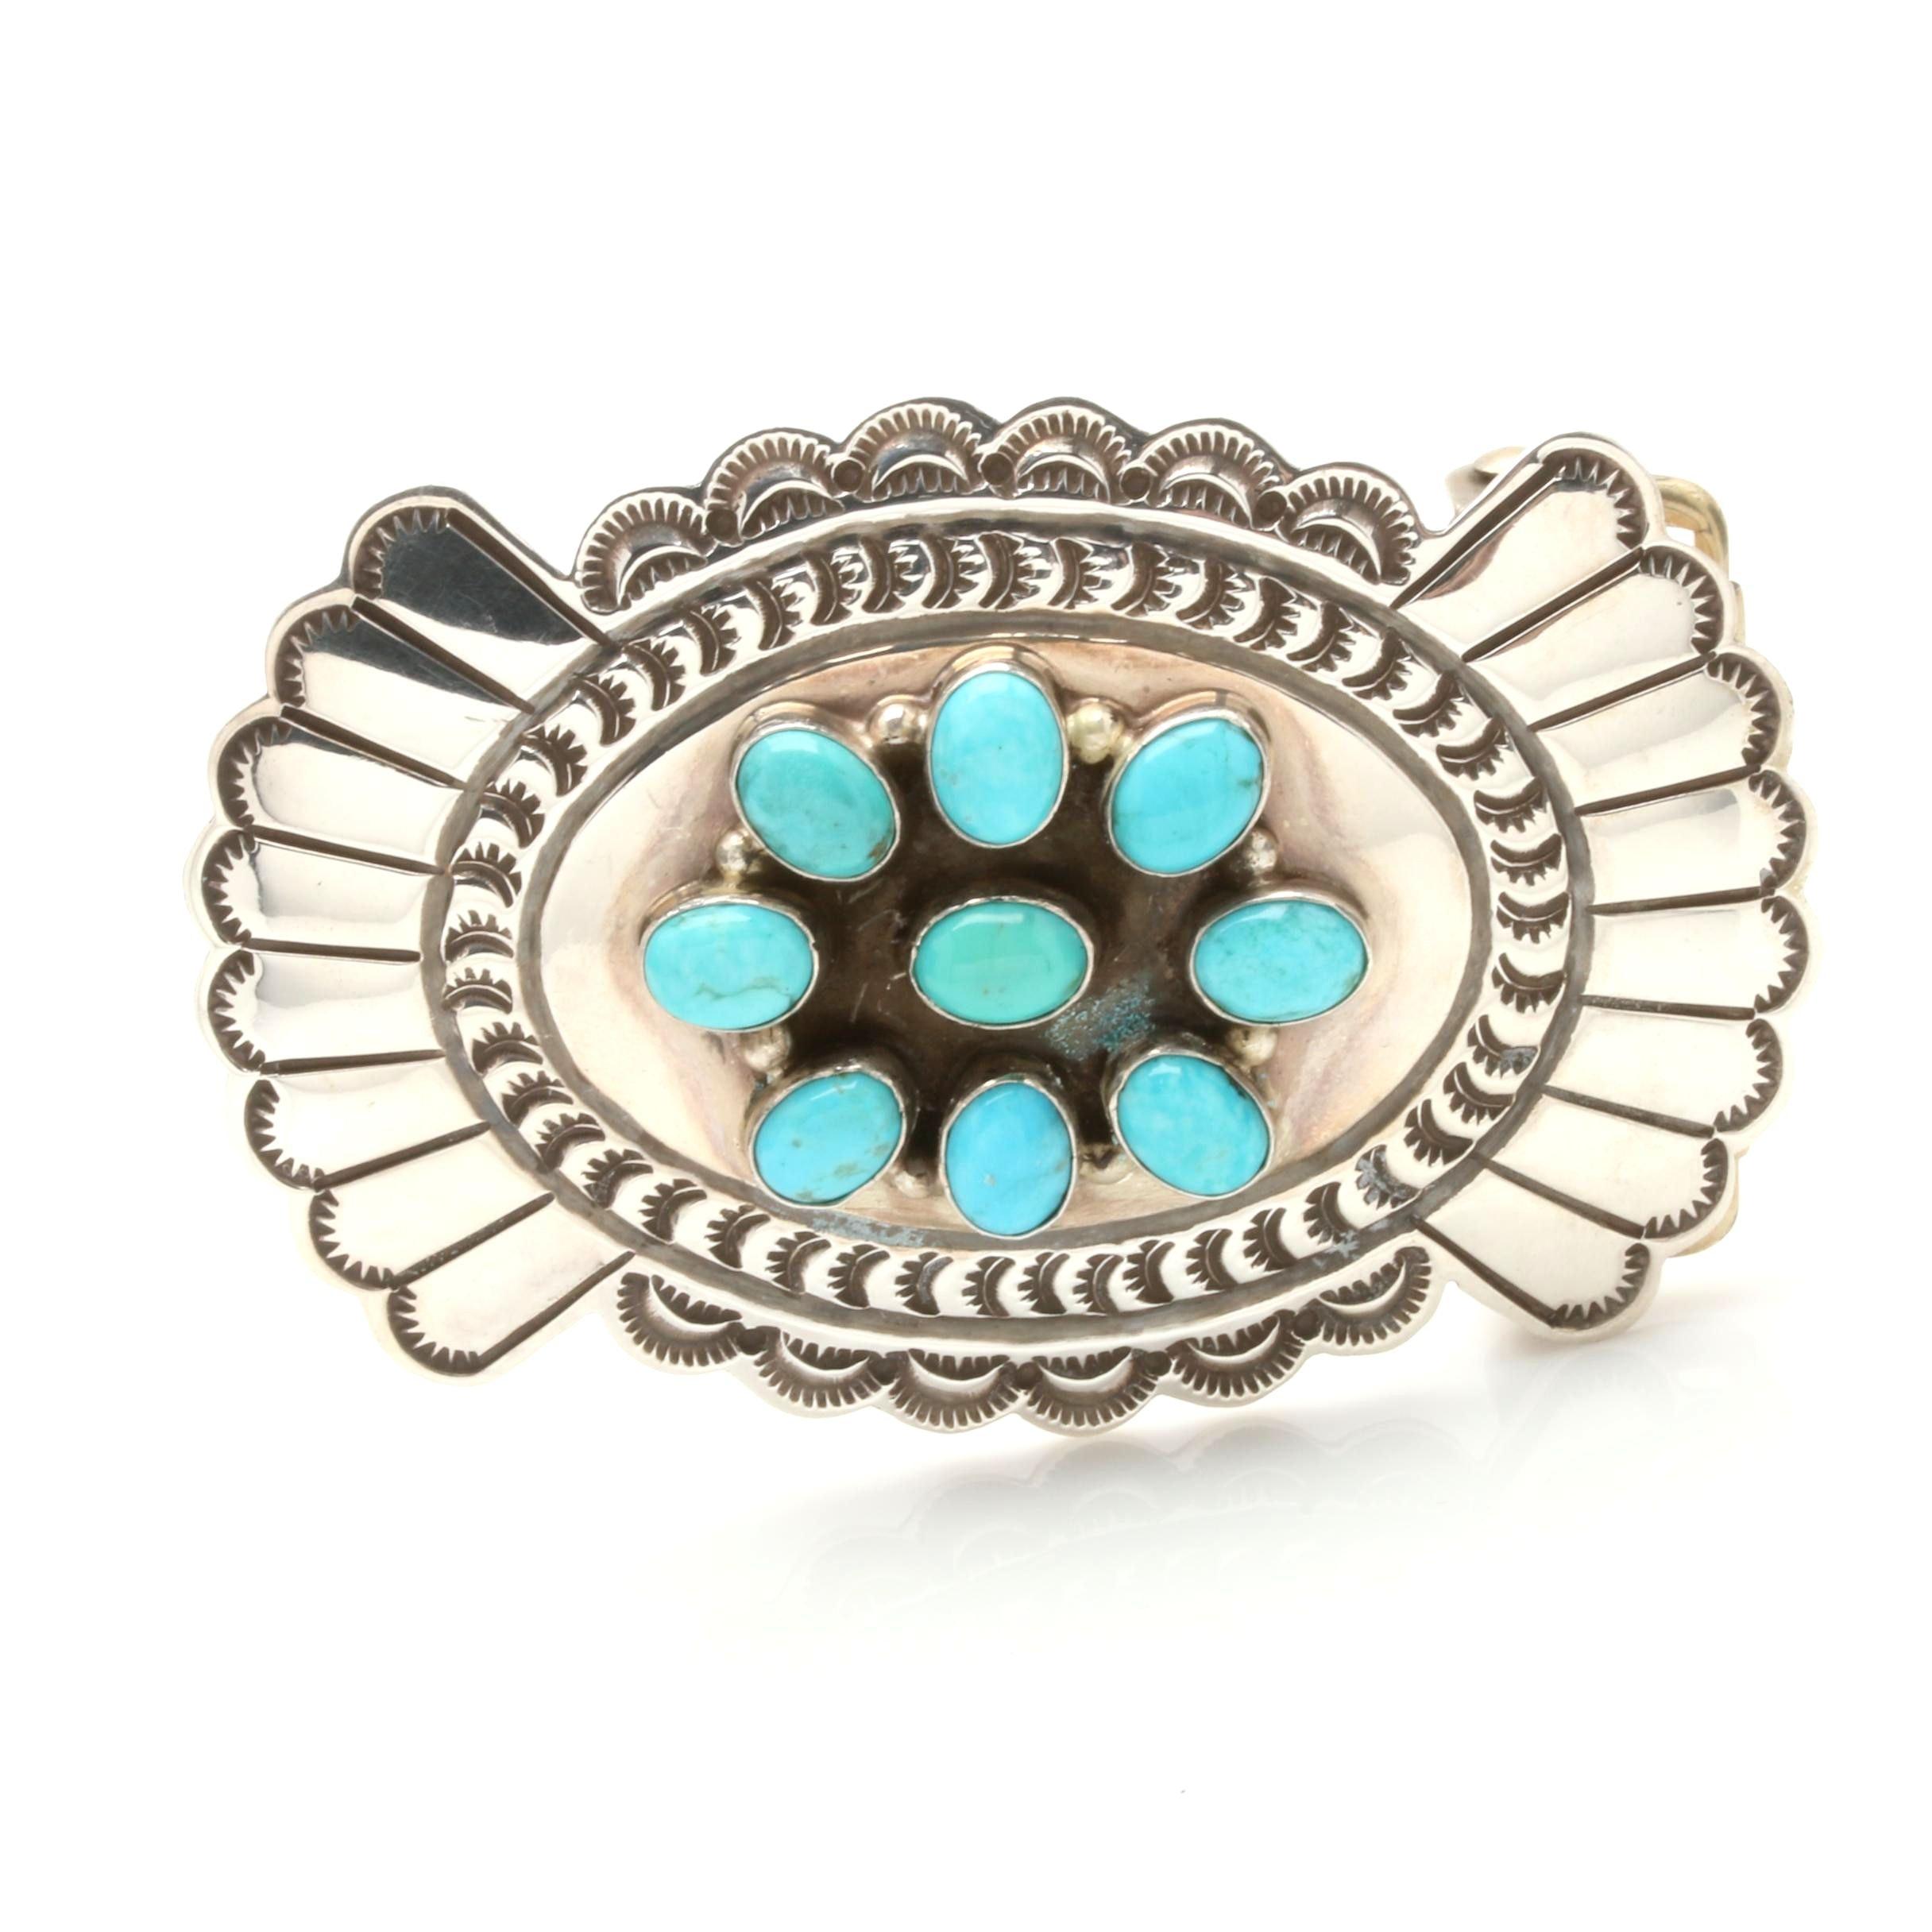 Delbert Delgarito Navajo Diné Sterling Silver Turquoise Belt Buckle